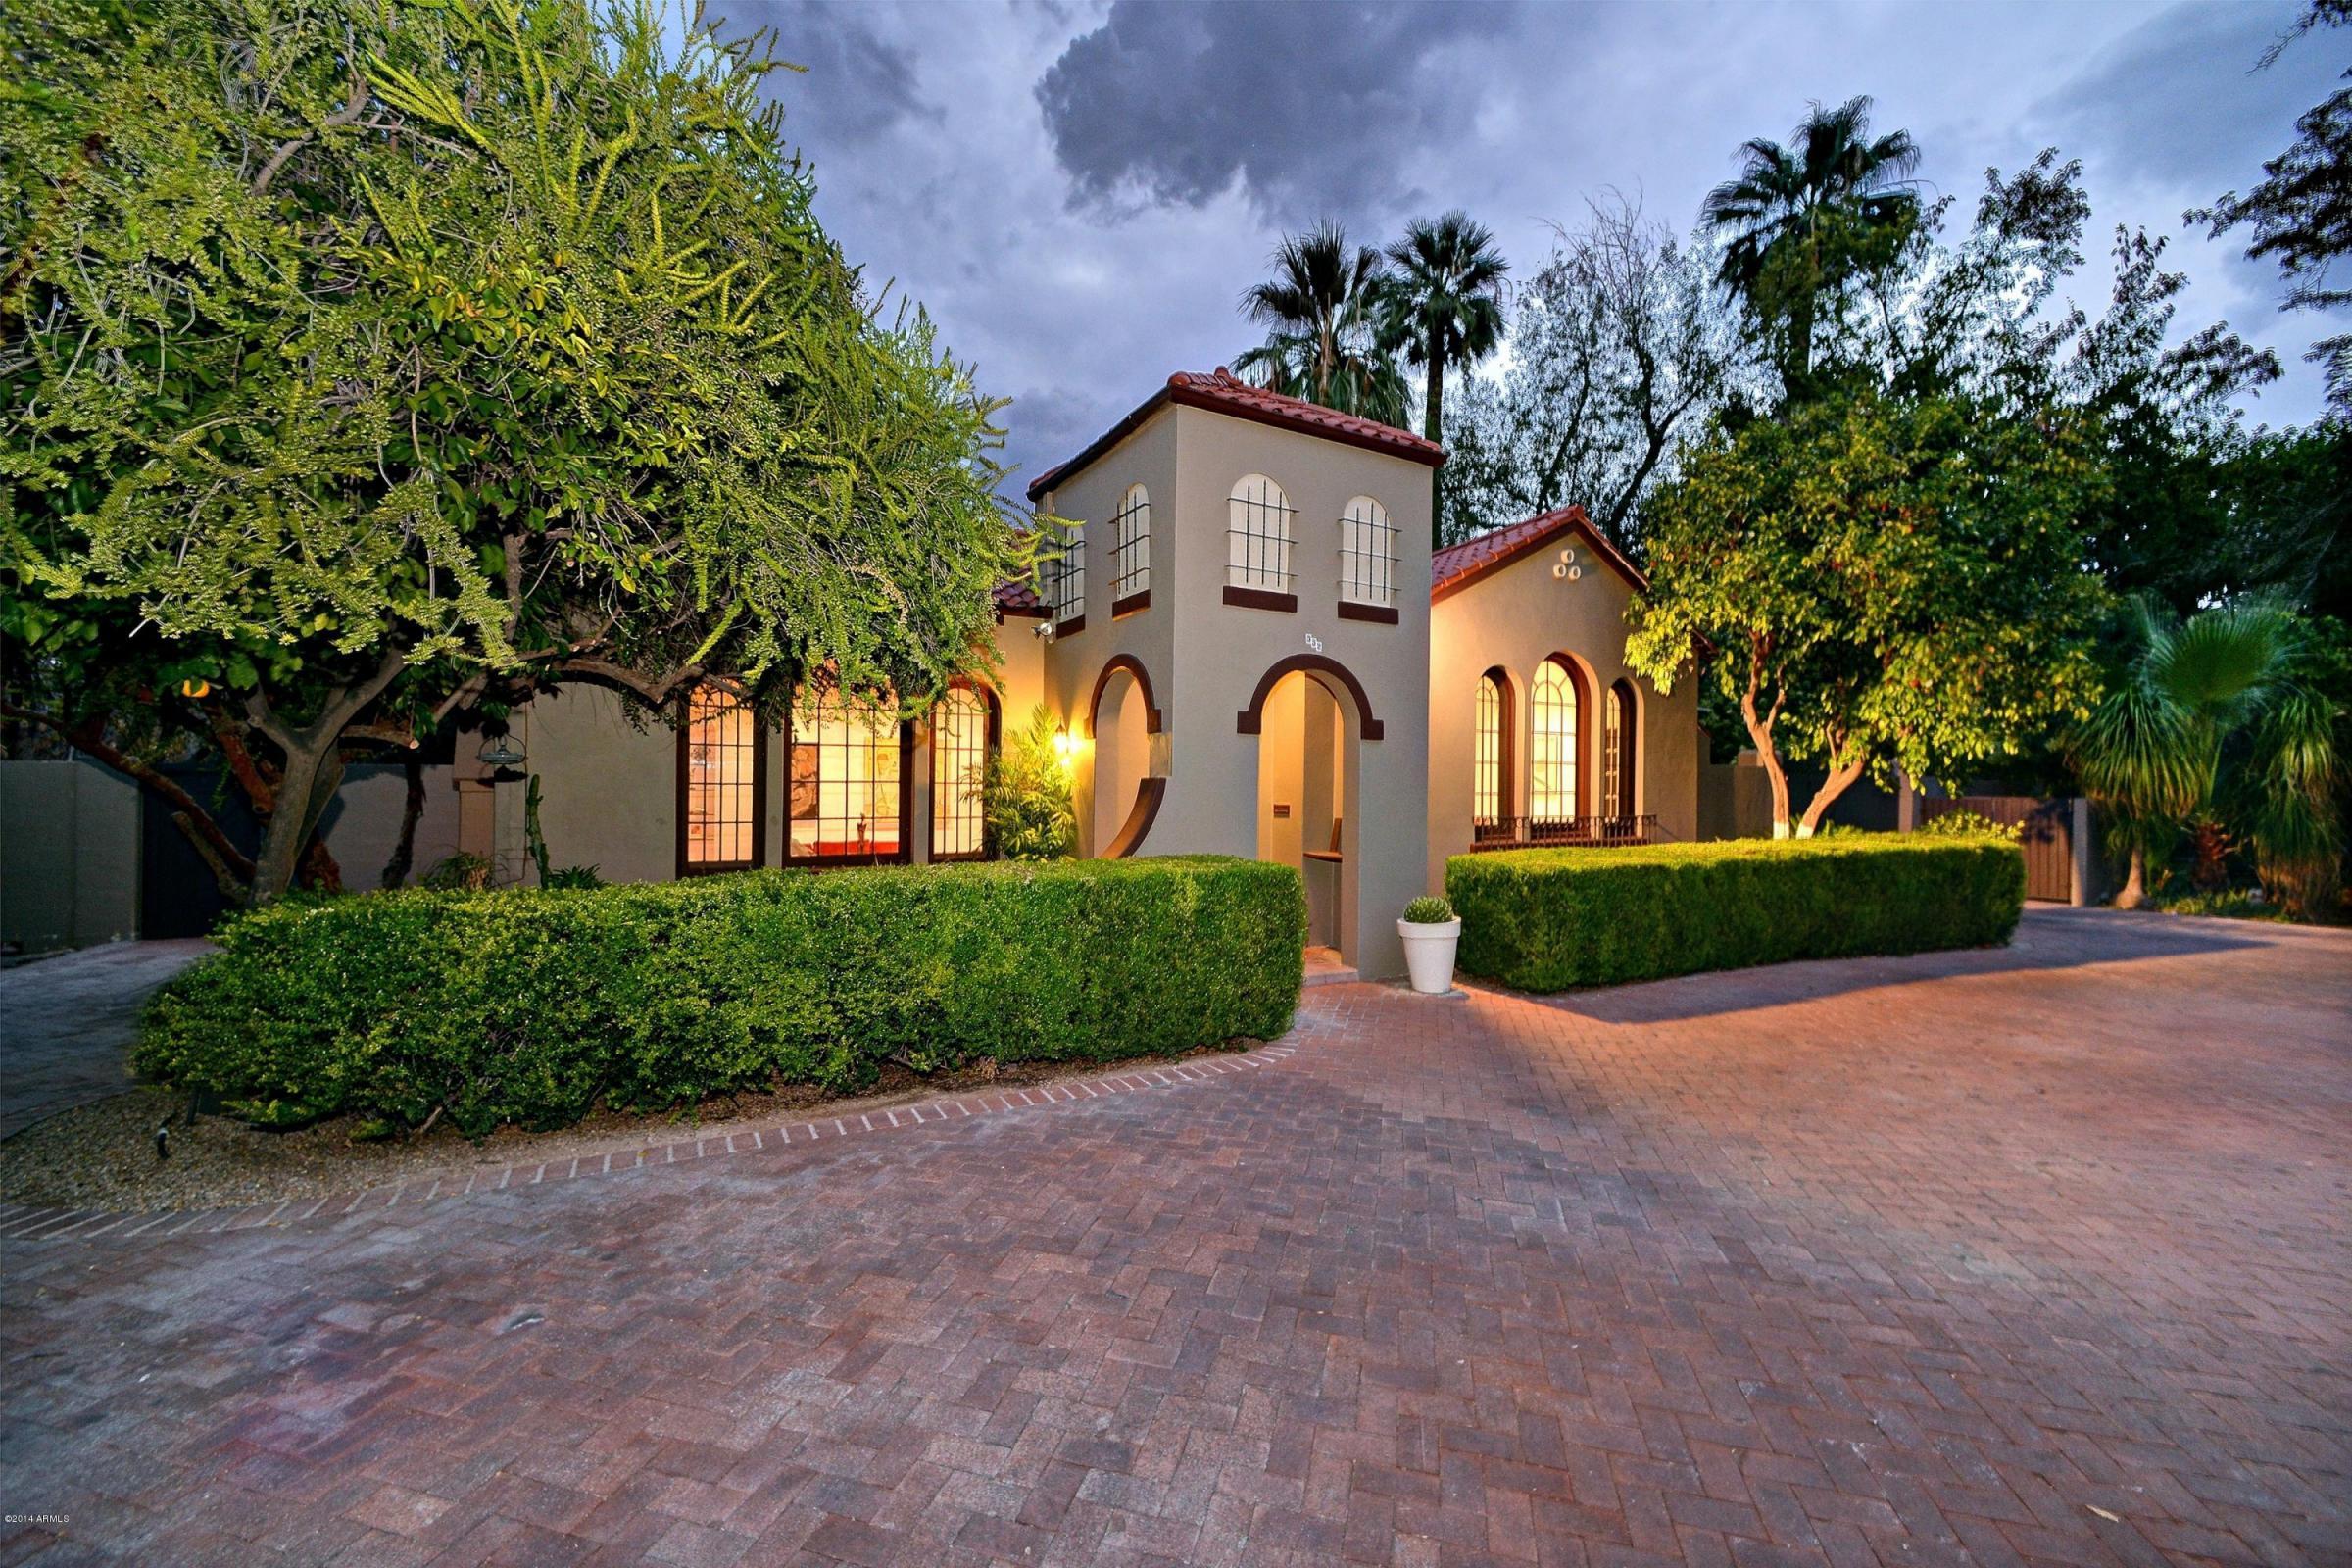 Los Olivos Historic District Real Estate for sale in Central Phoenix AZ